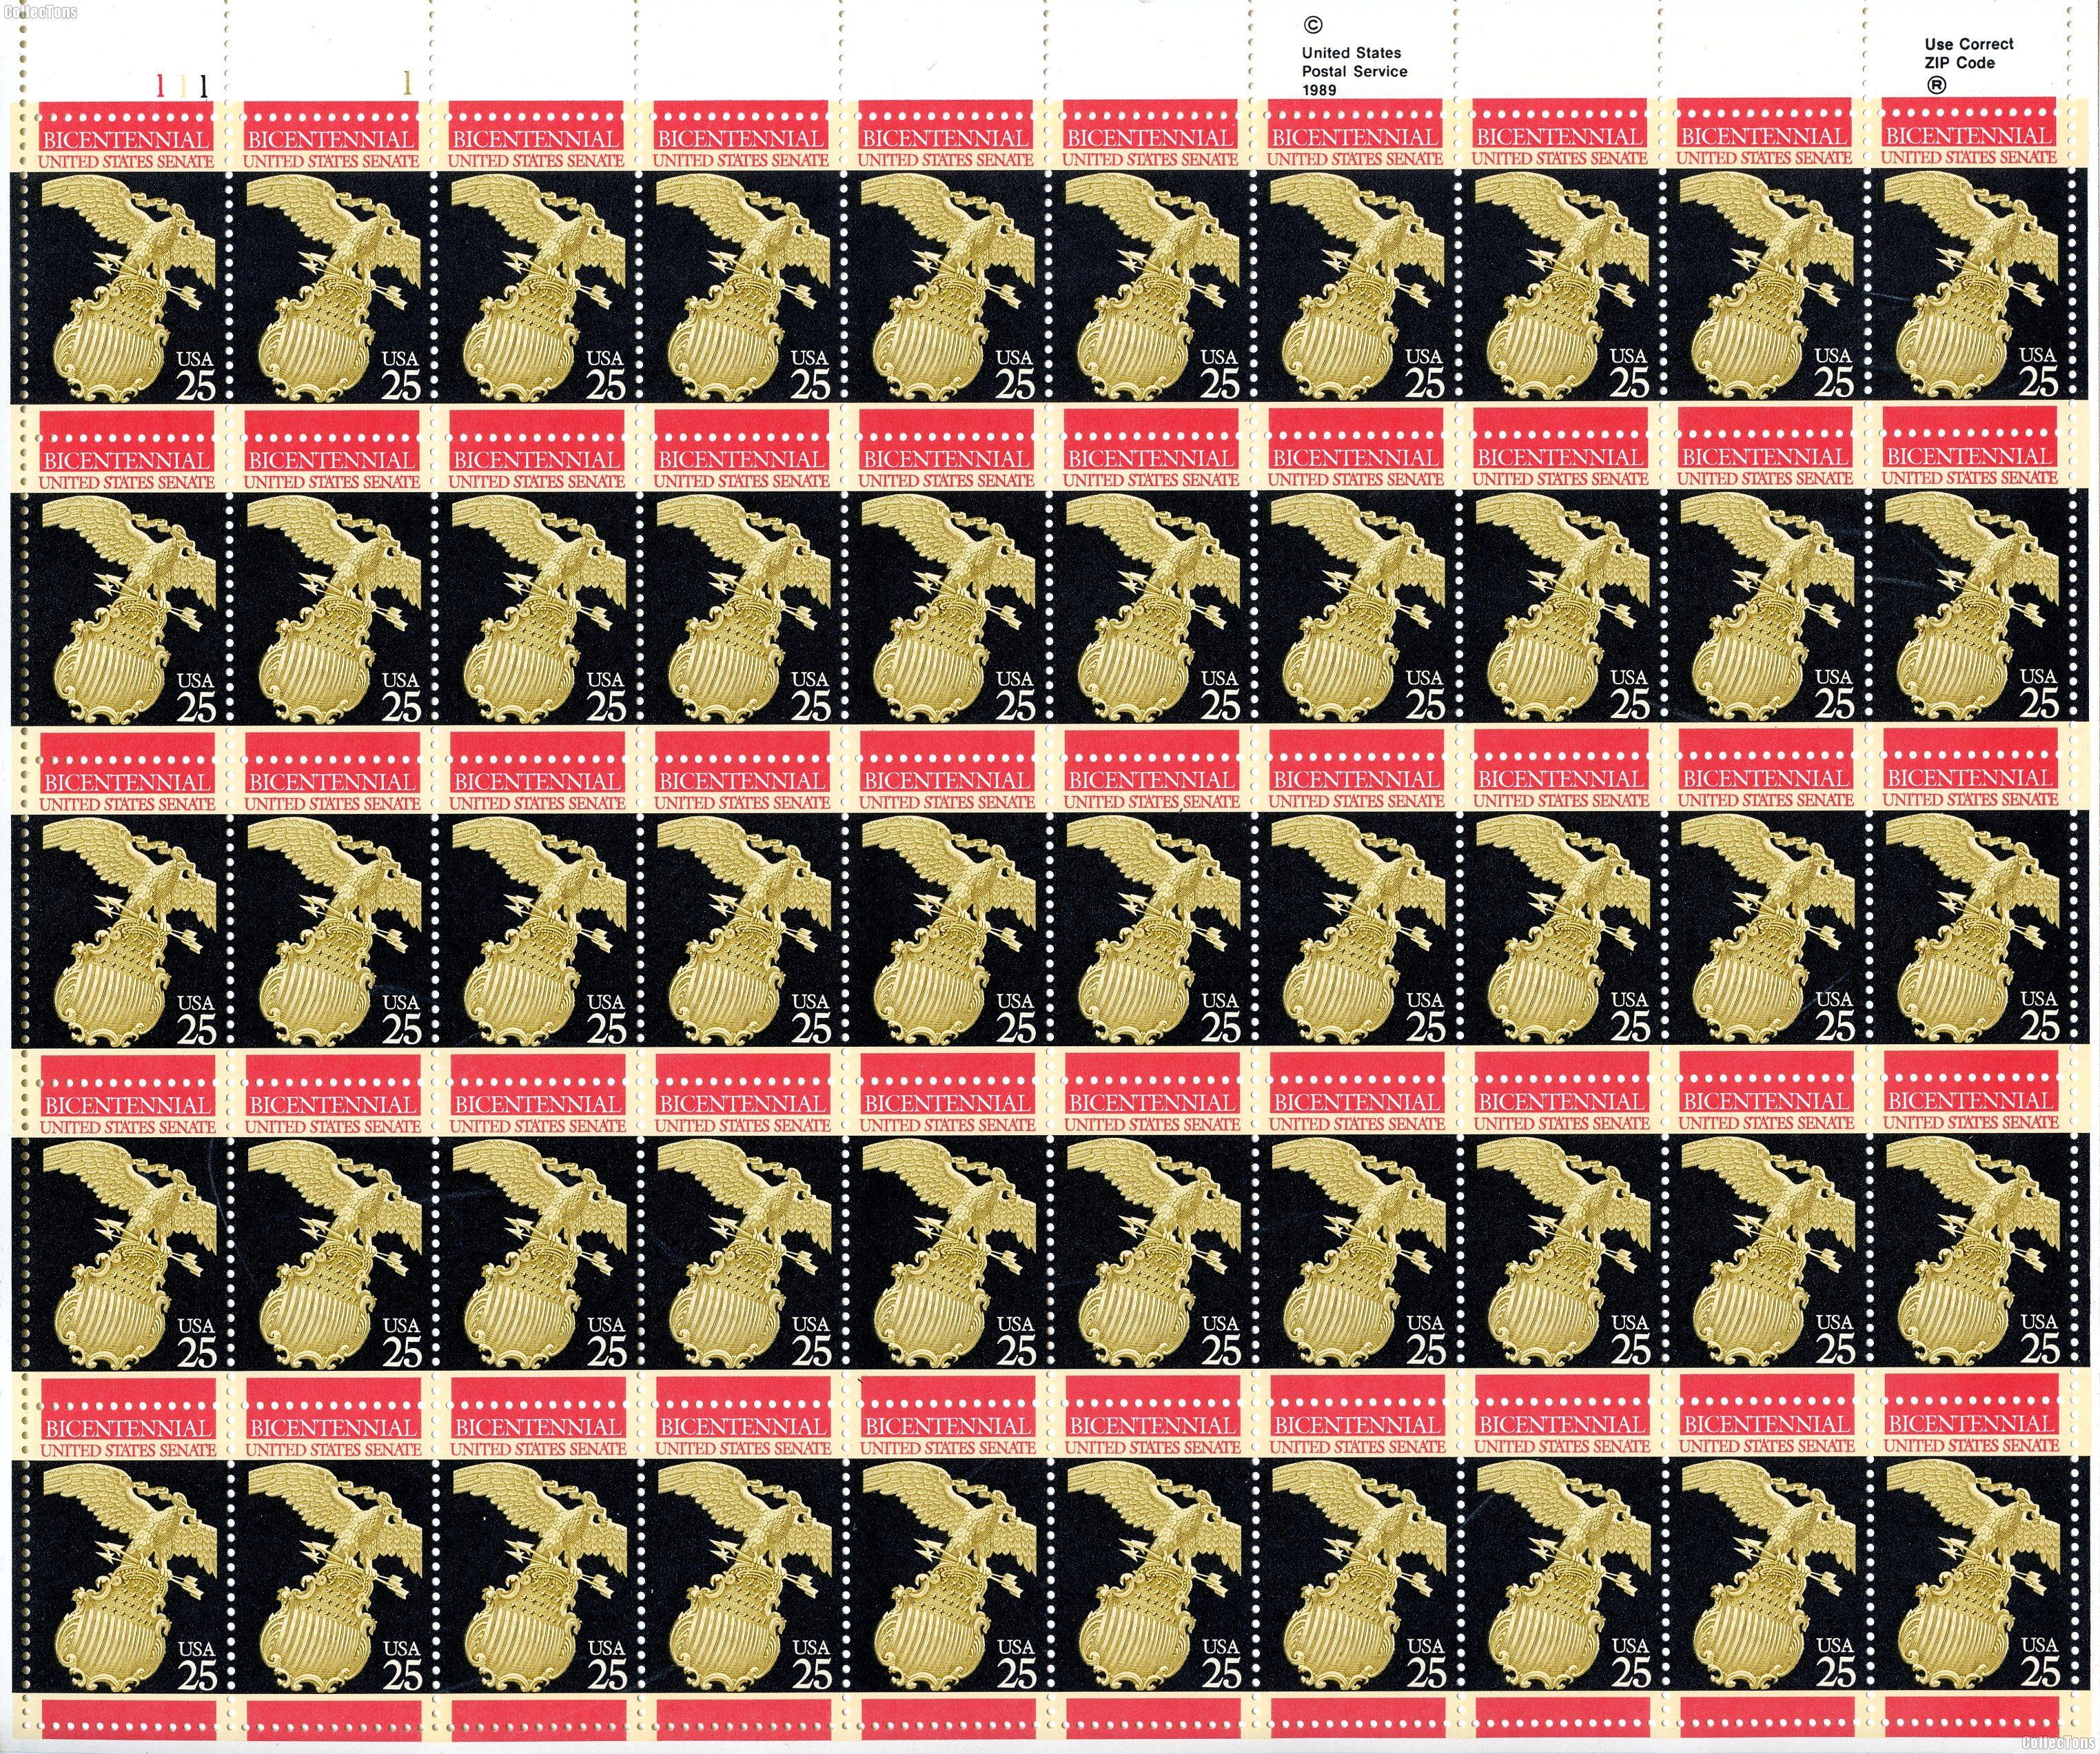 1989 U.S. Senate 25 Cent US Postage Stamp MNH Sheet of 50 Scott #2413